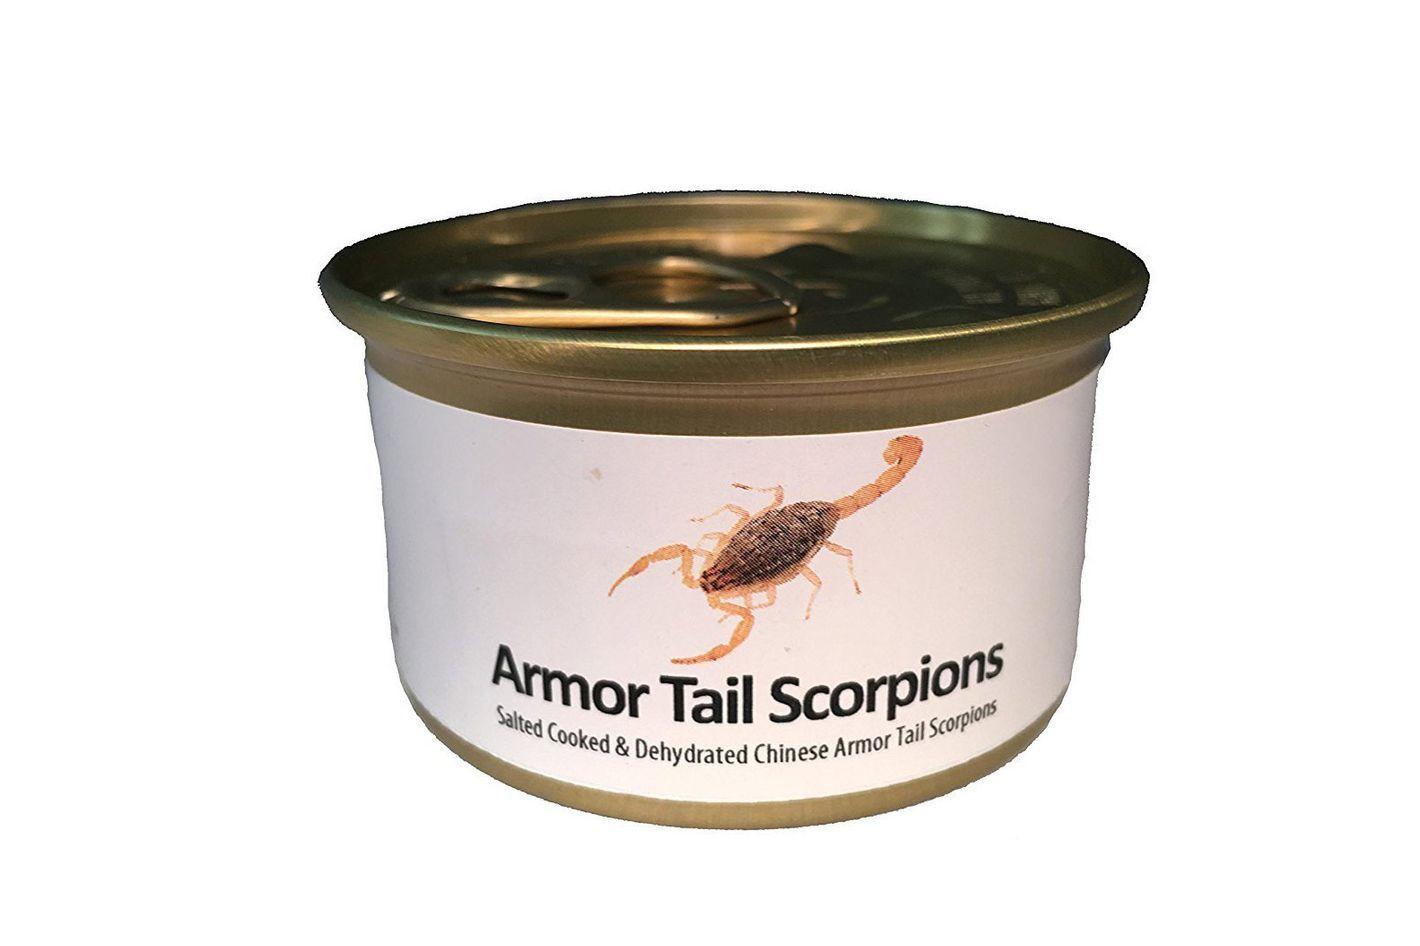 Edible Armor Tail Scorpions